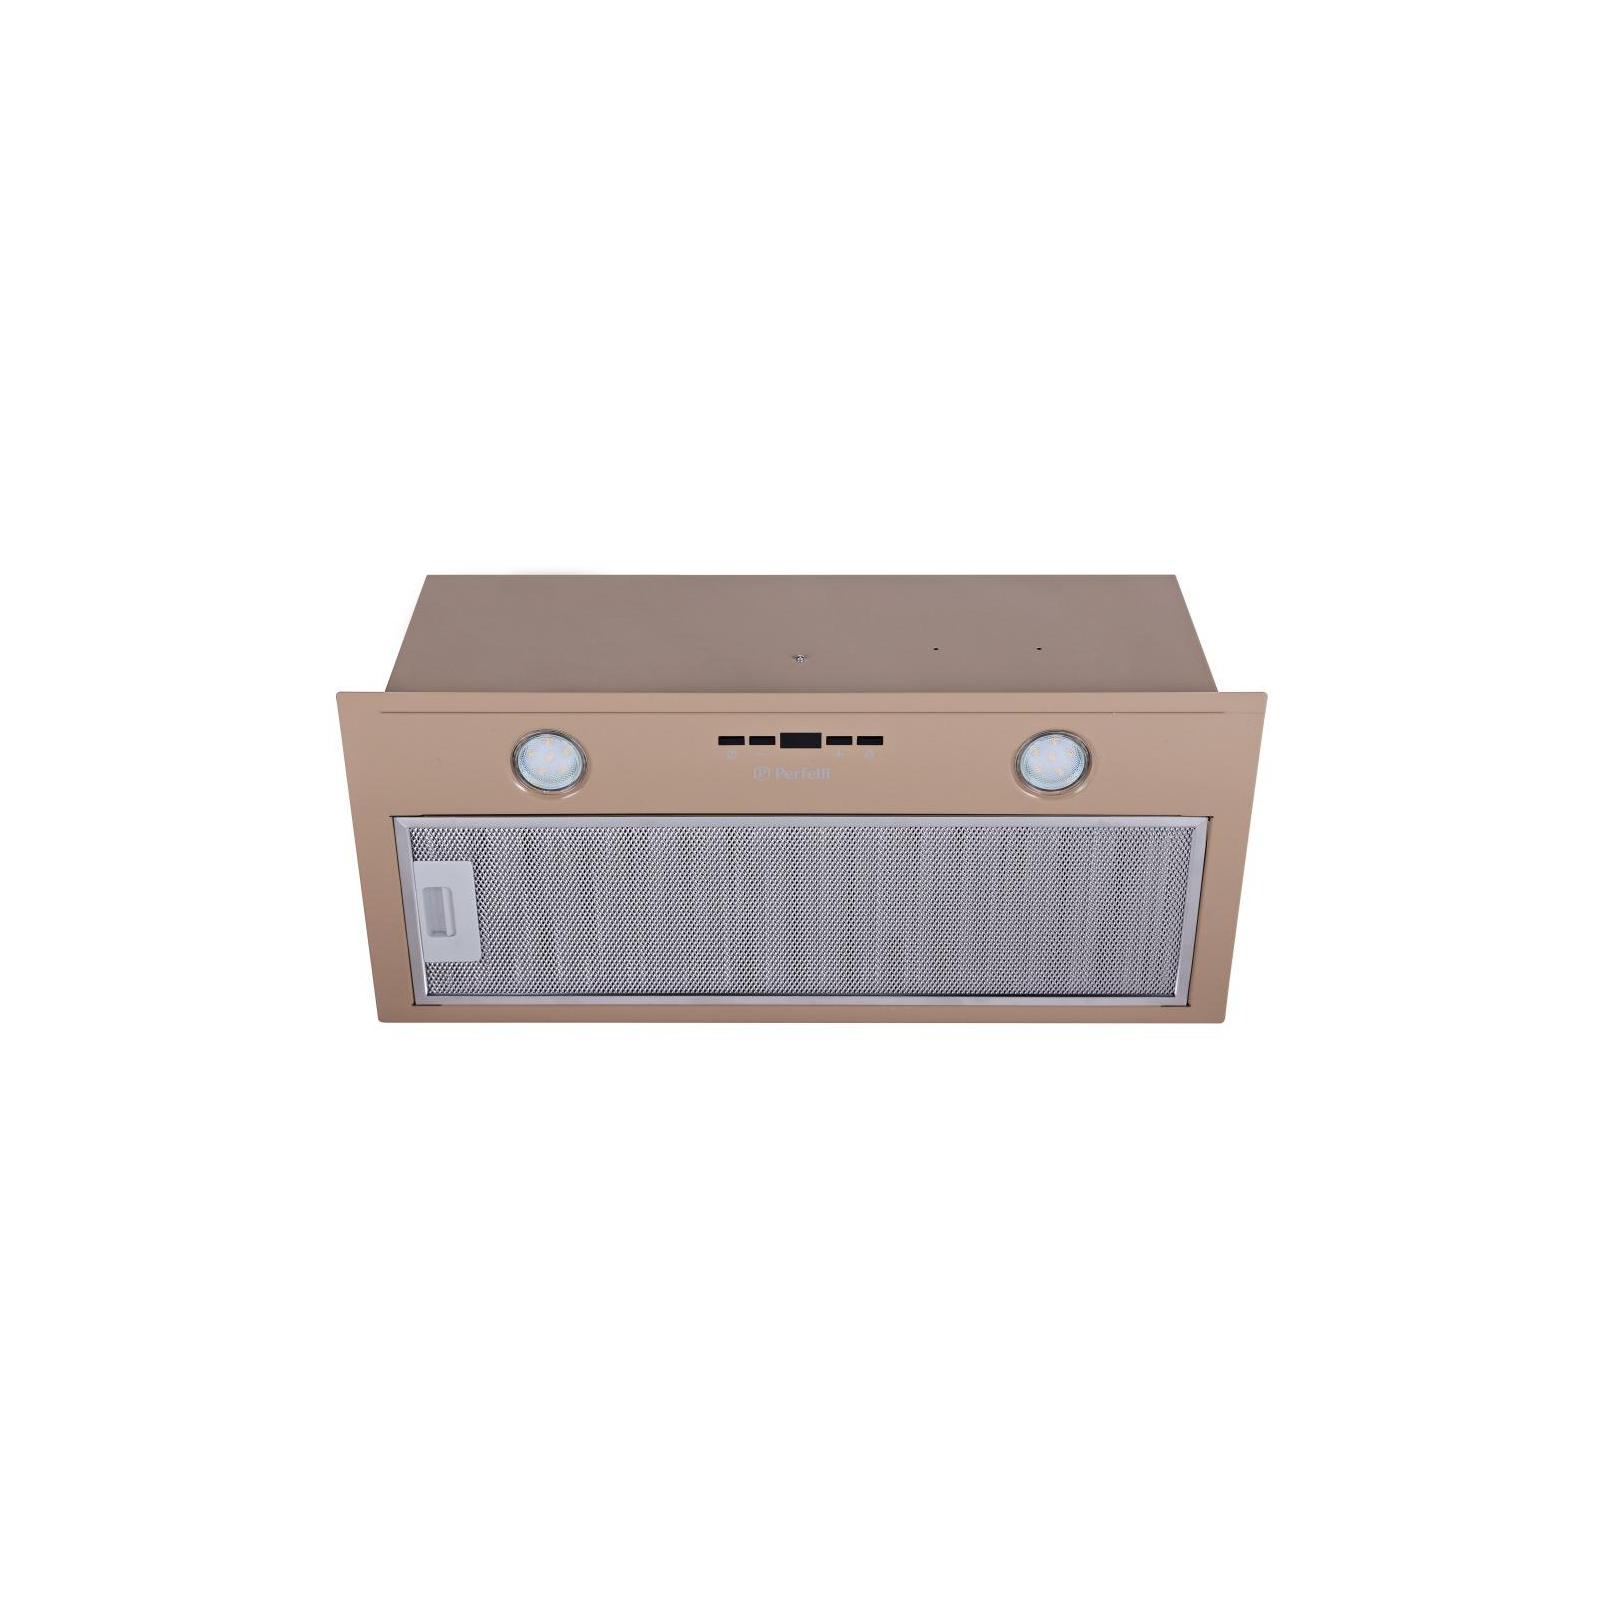 Вытяжка кухонная PERFELLI BIET 6512 A 1000 DARK IV LED